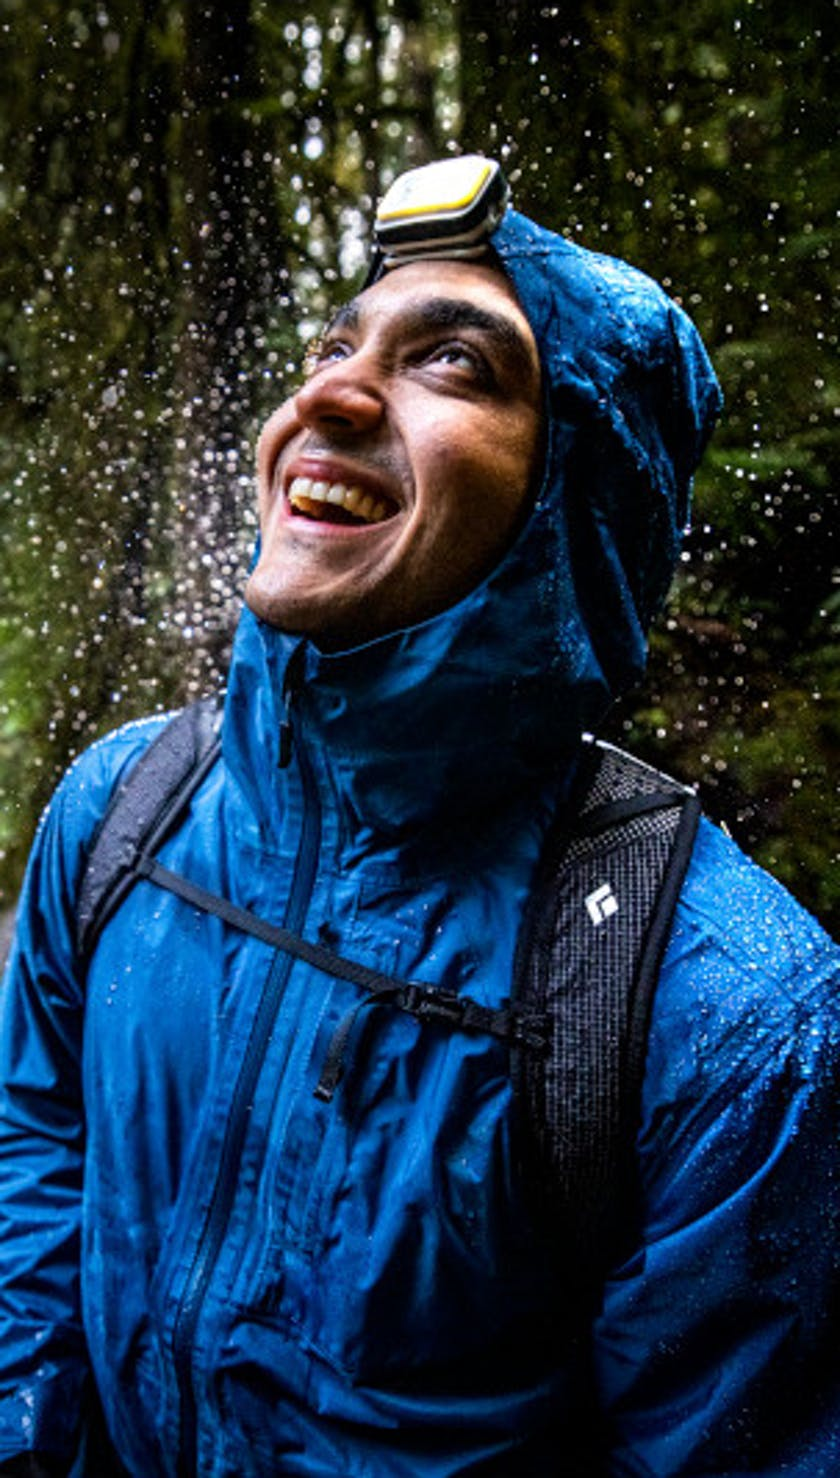 Man enjoying the rain in his Treeline shell